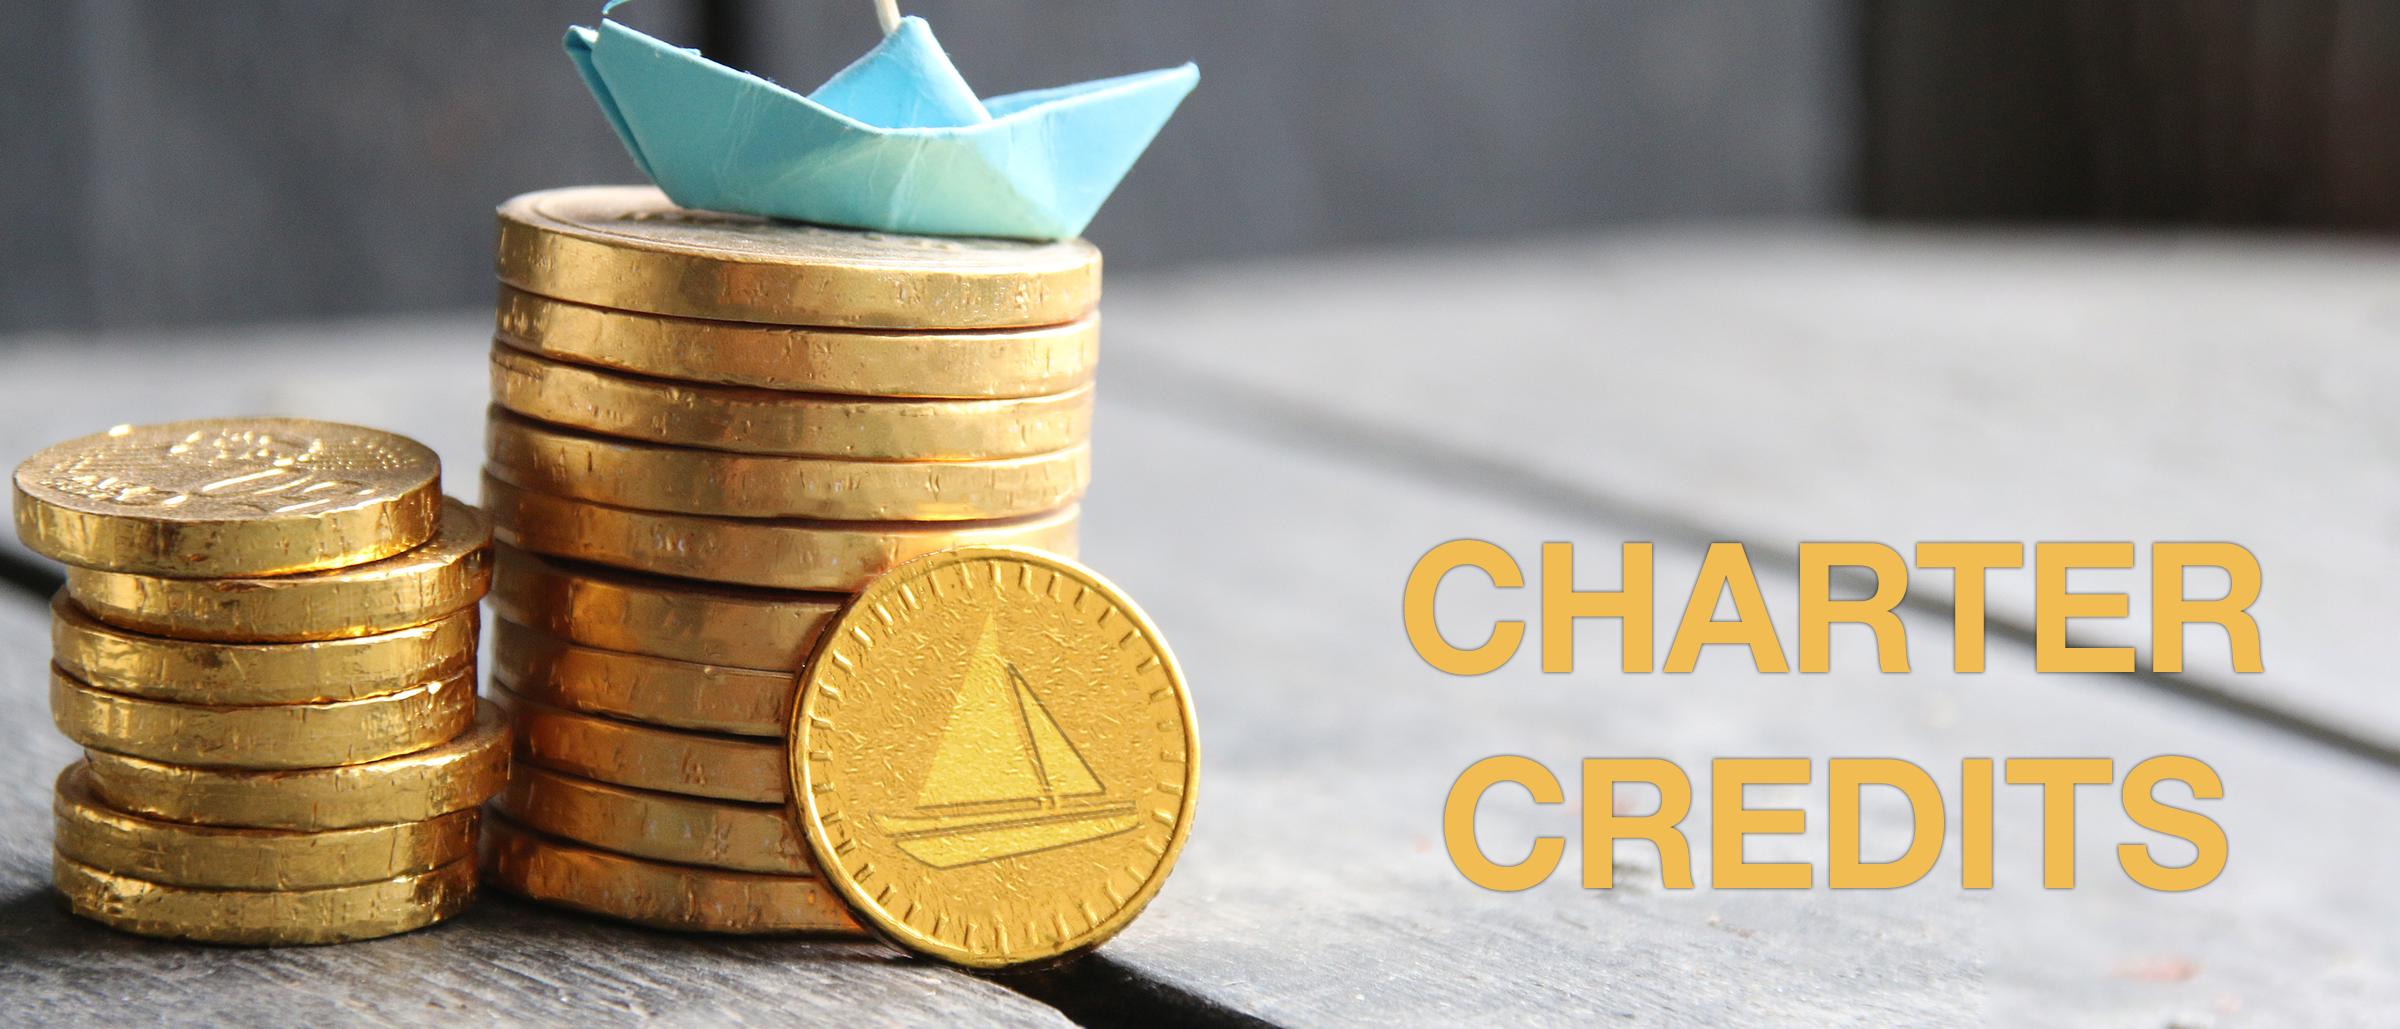 Charter credits